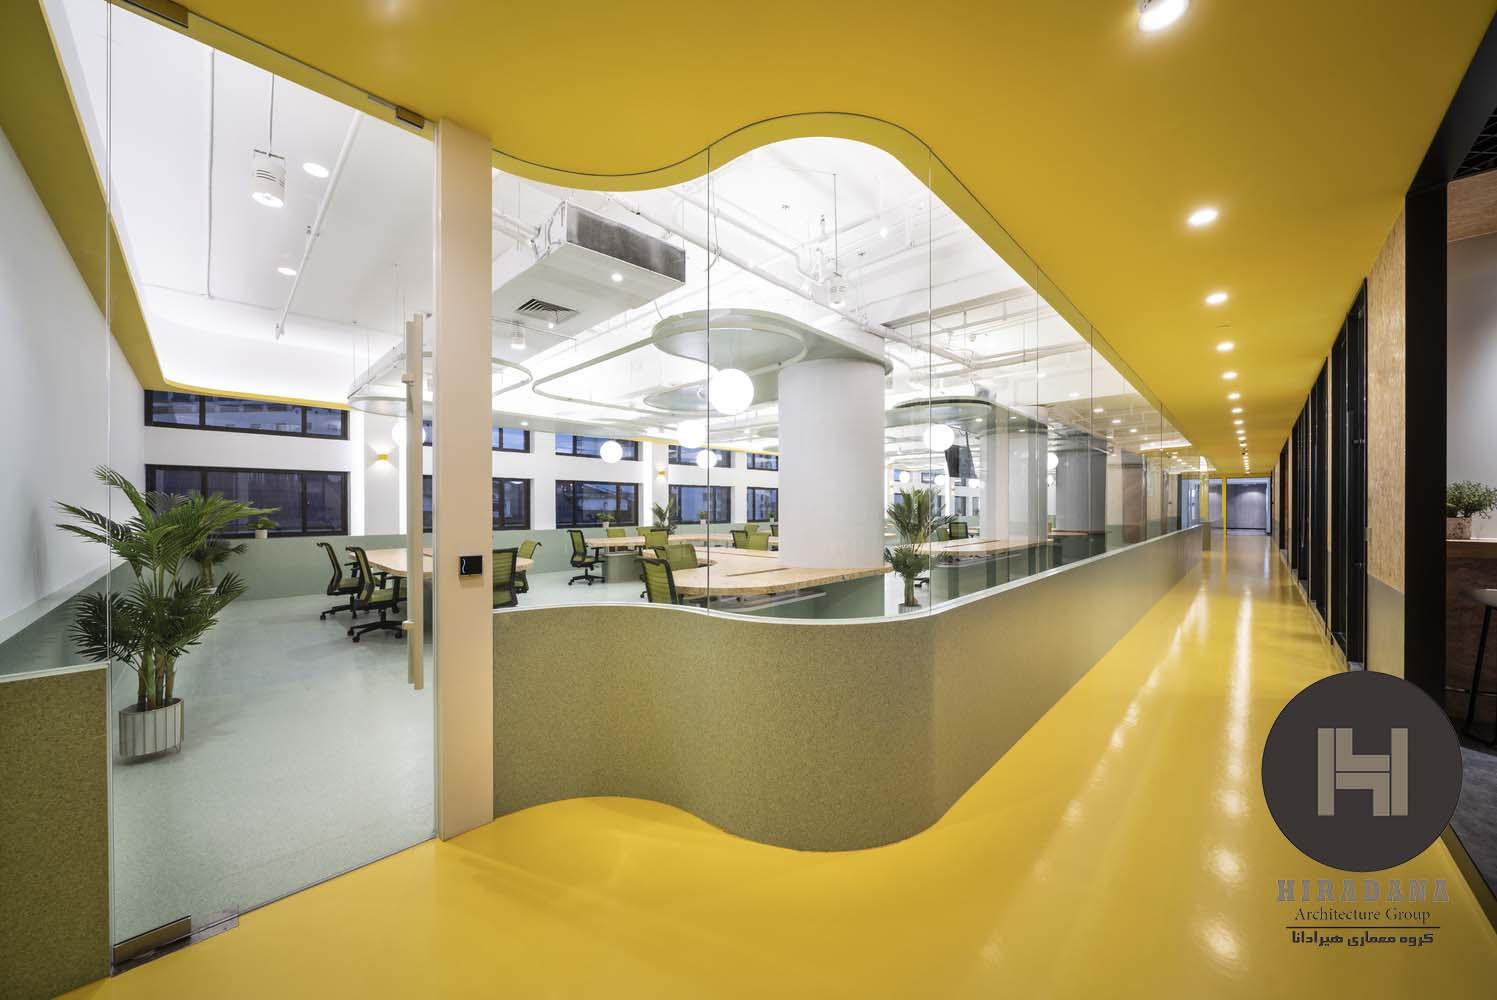 طراحی دکوراسیون اداری با رنگ زرد